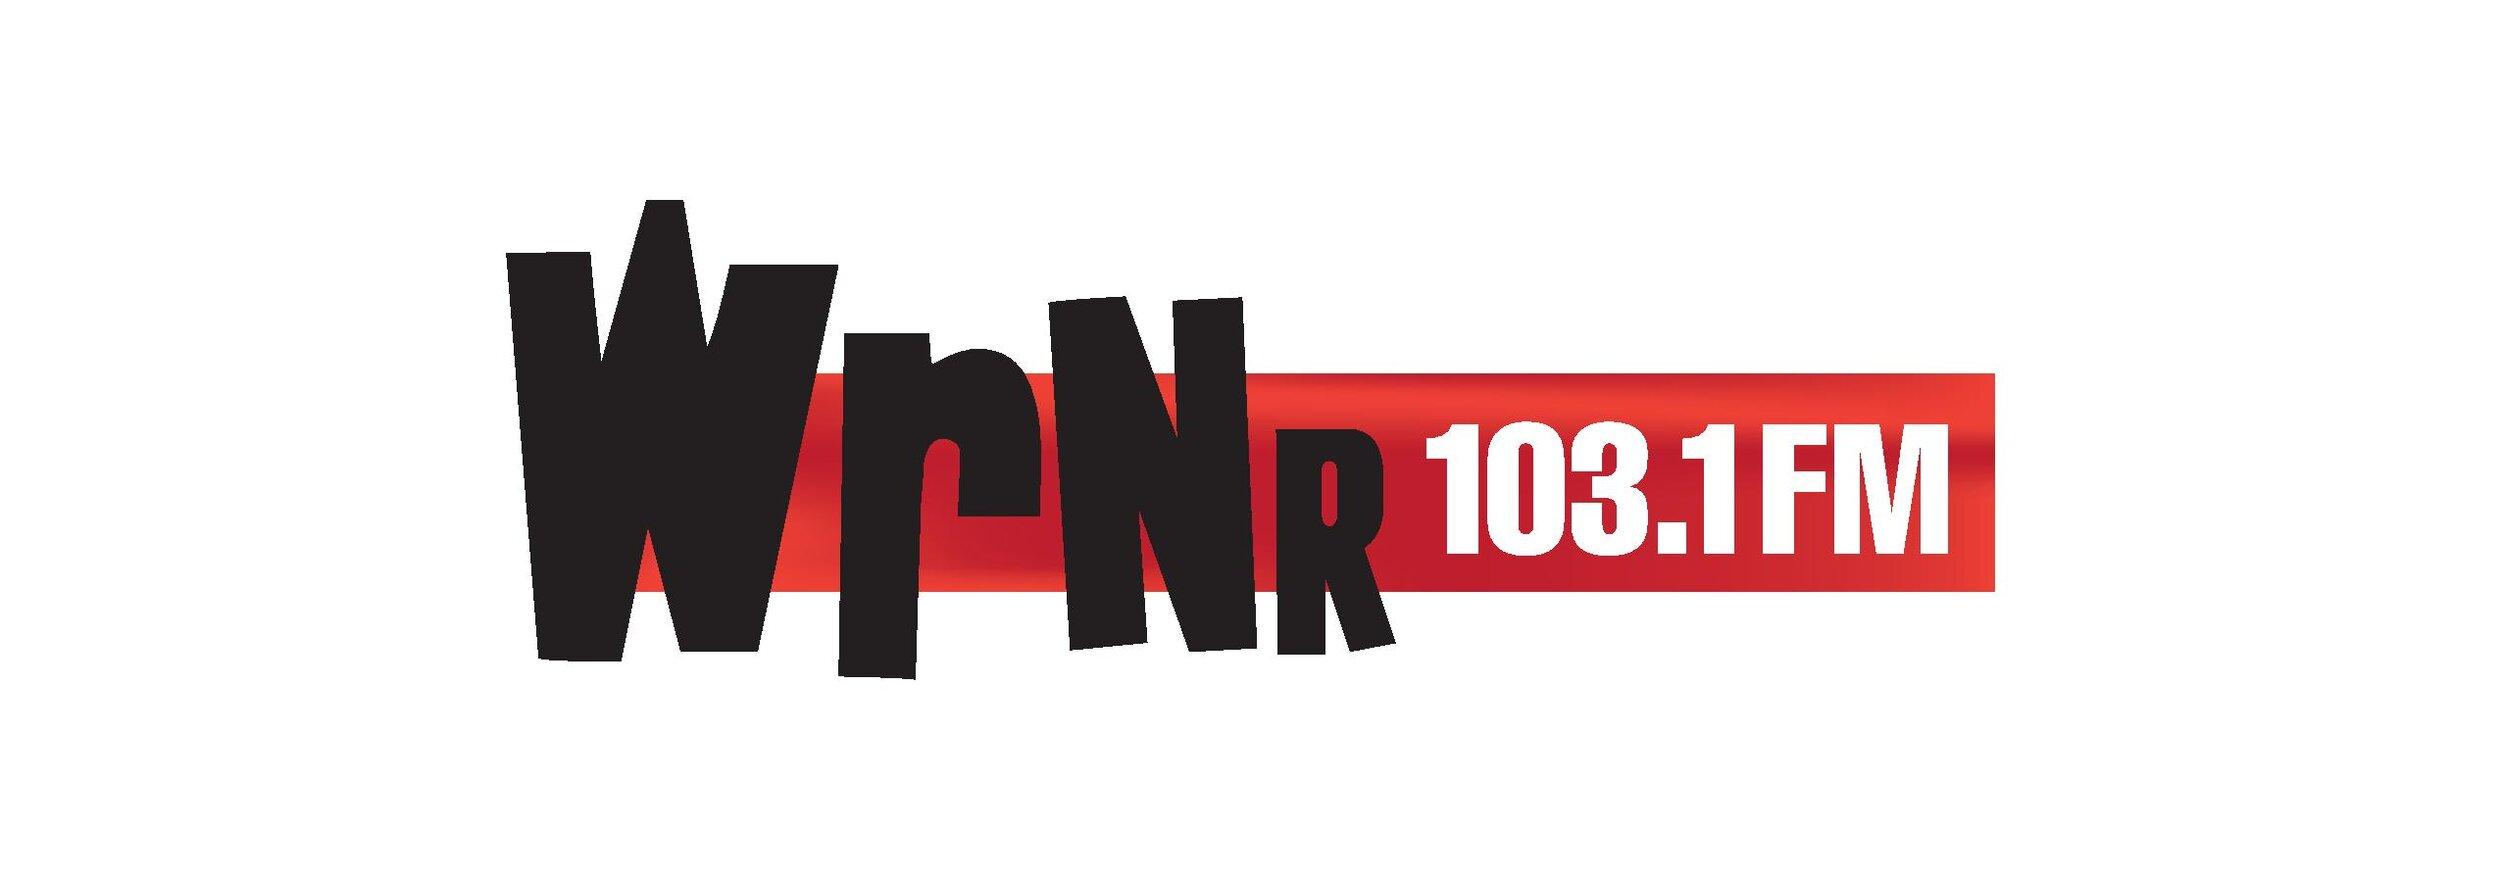 WRNR-Logo-2016-v2-page-001.jpg